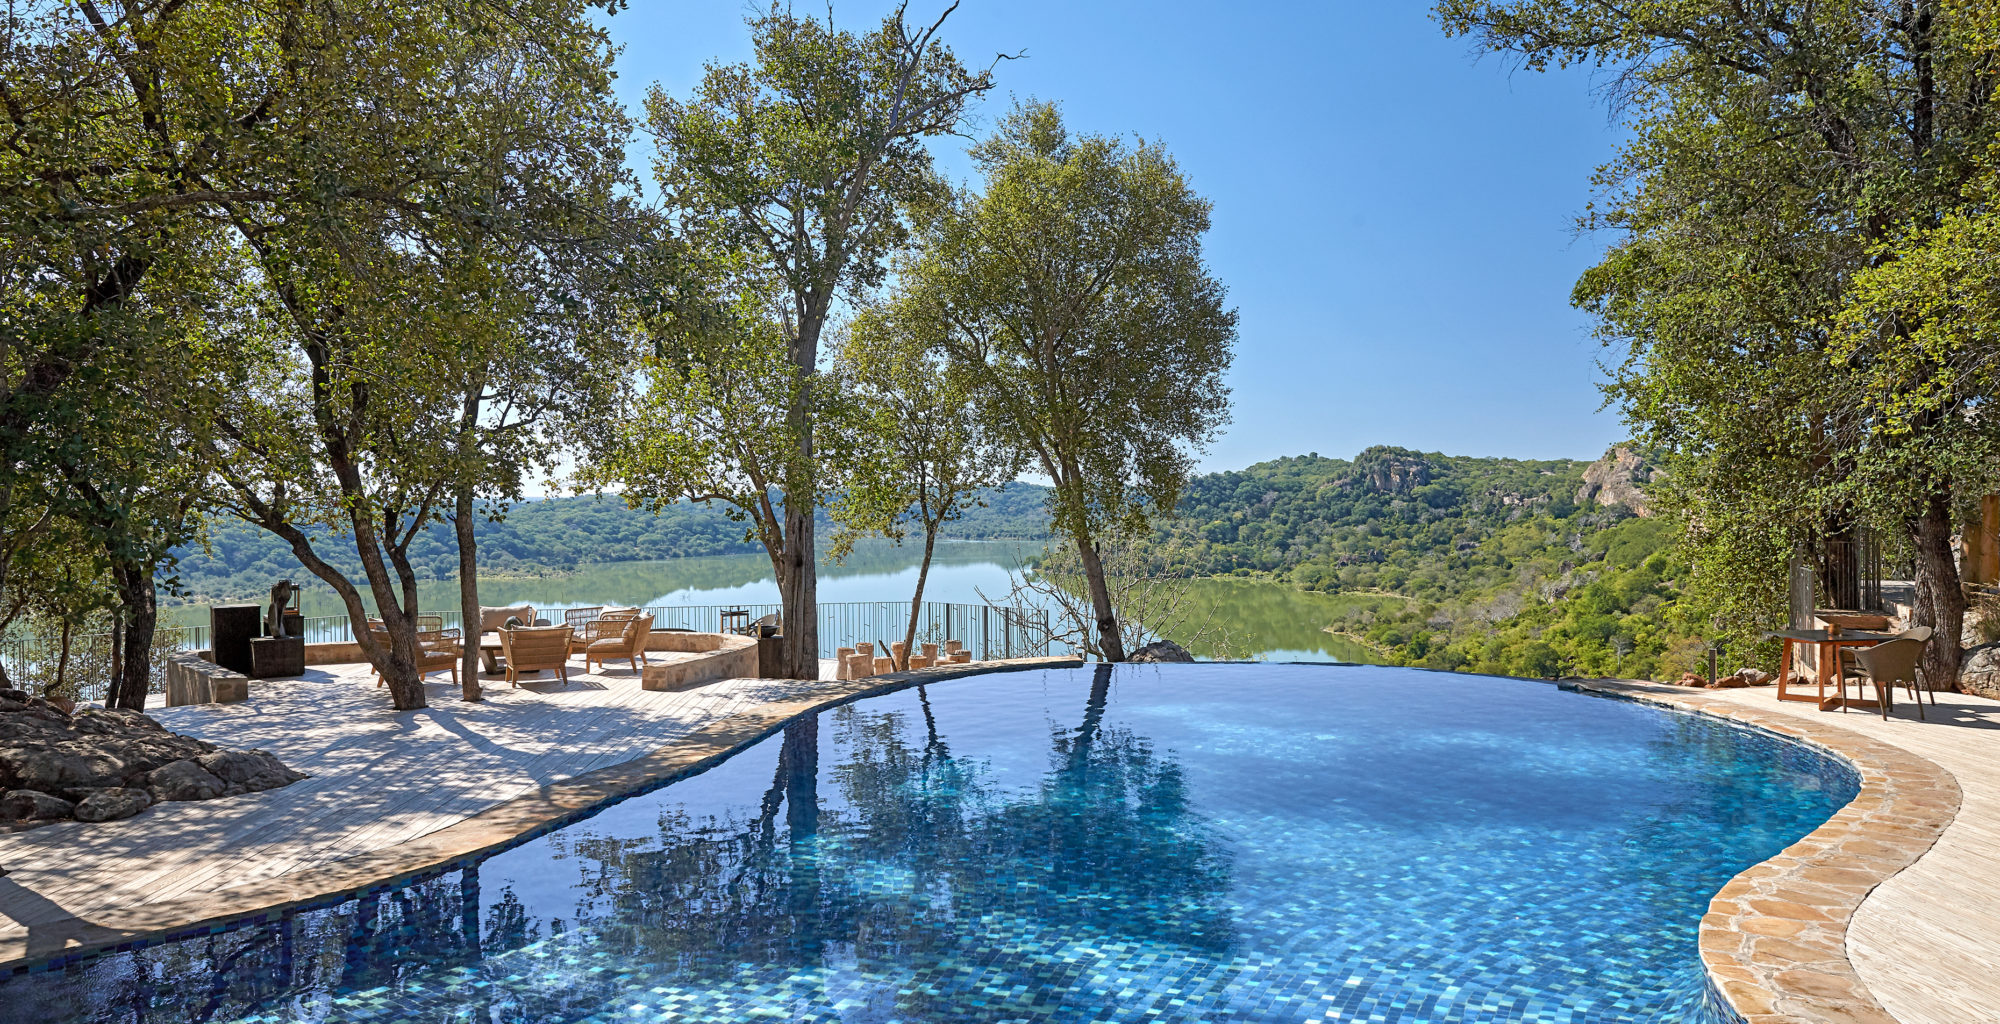 singita_pamushana_lodge_-_pool_during_the_day